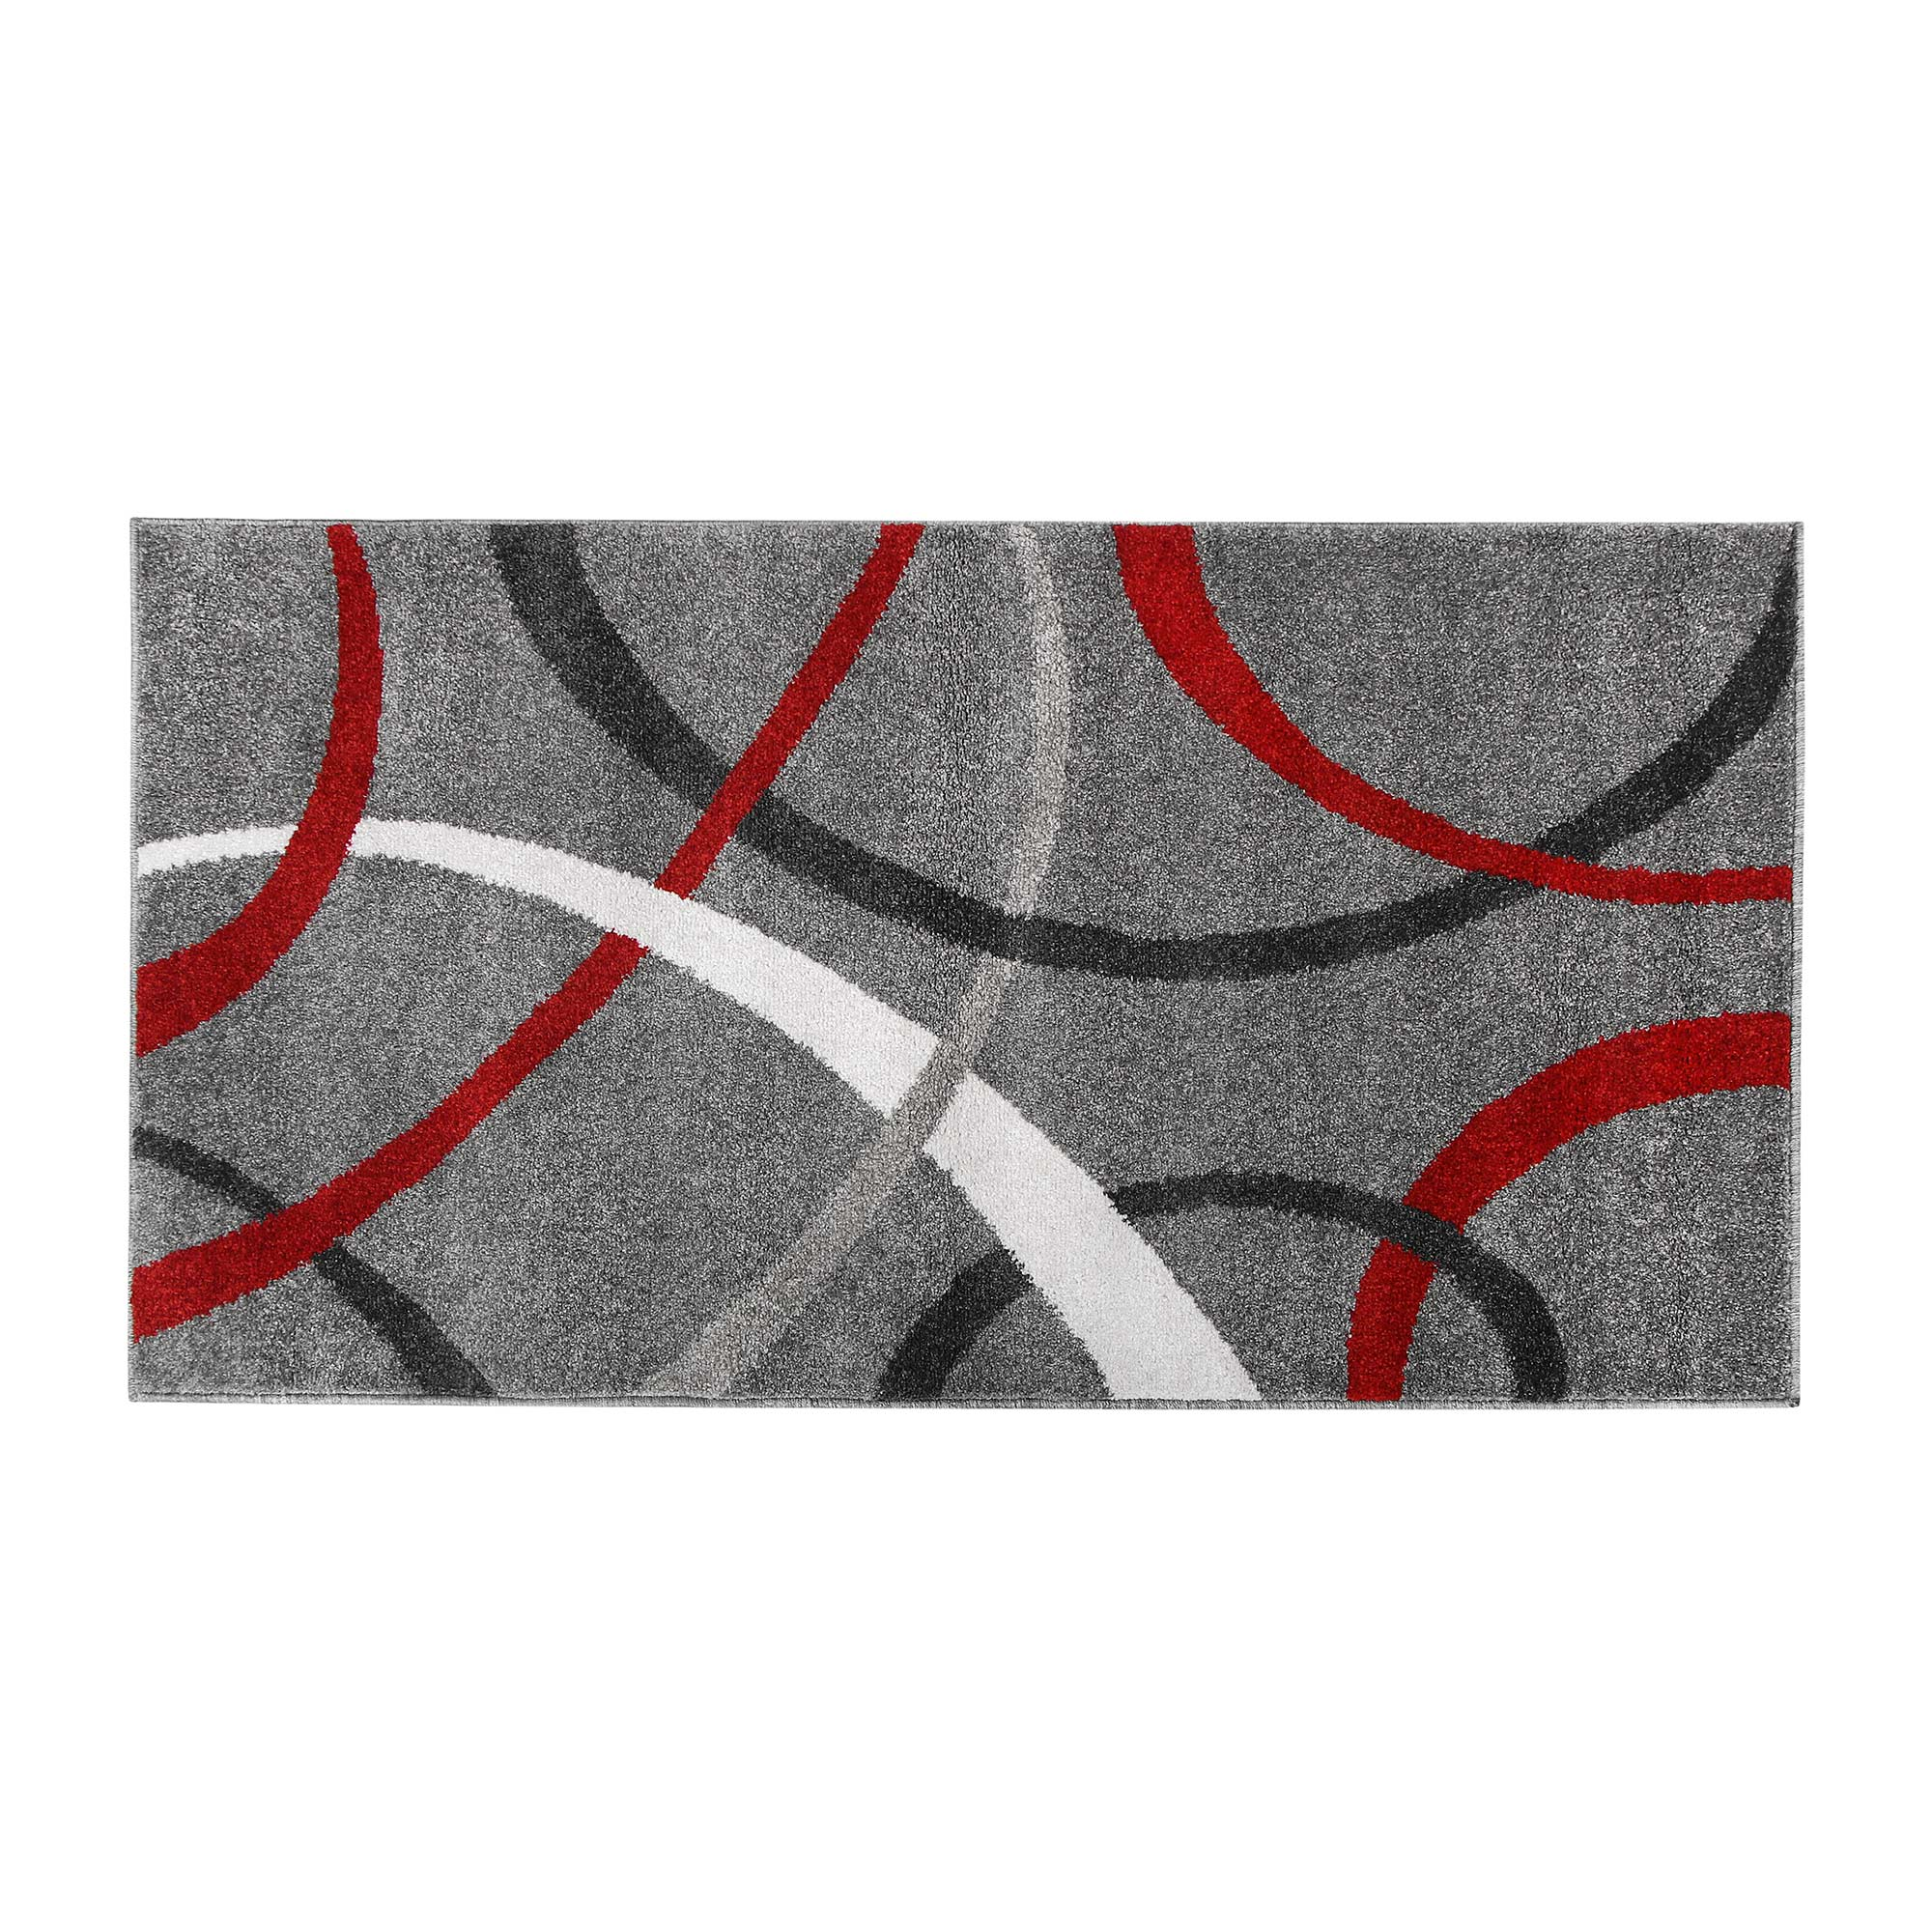 Фото - Коврик темно-серый/красный Abc tr terra 80х150 коврик серый 80x50 abc la cucina zen